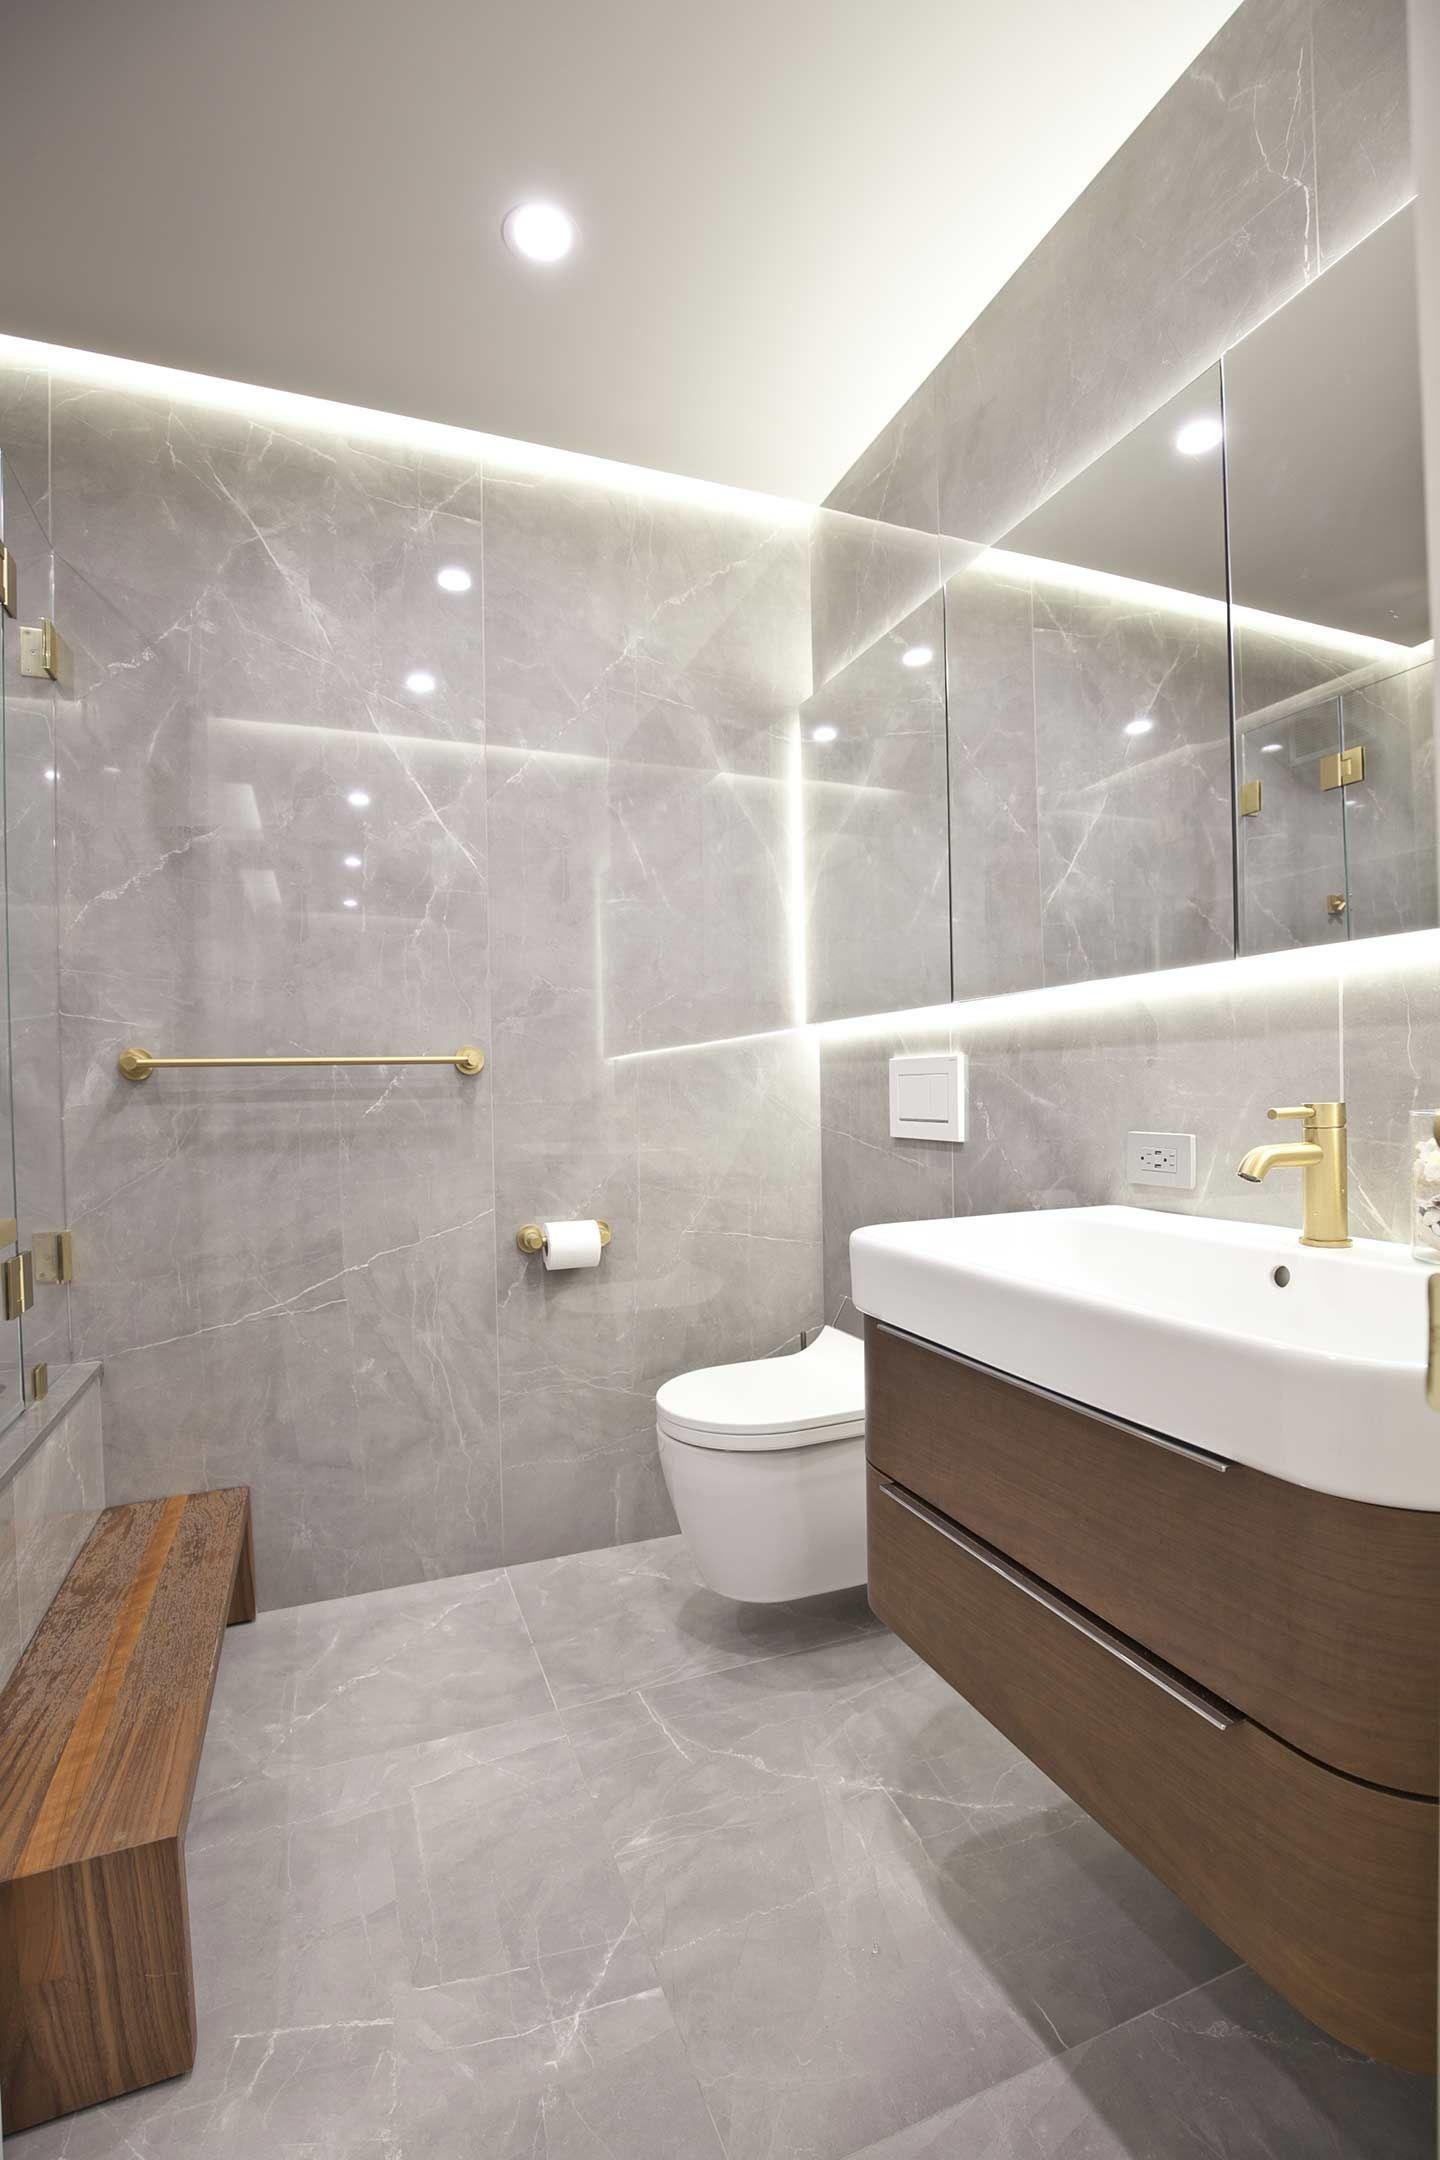 Pin By Leo Gres On Florim Projekt Kupatilo Kolekcija Timeless Bath Renovation Dream Bath Home